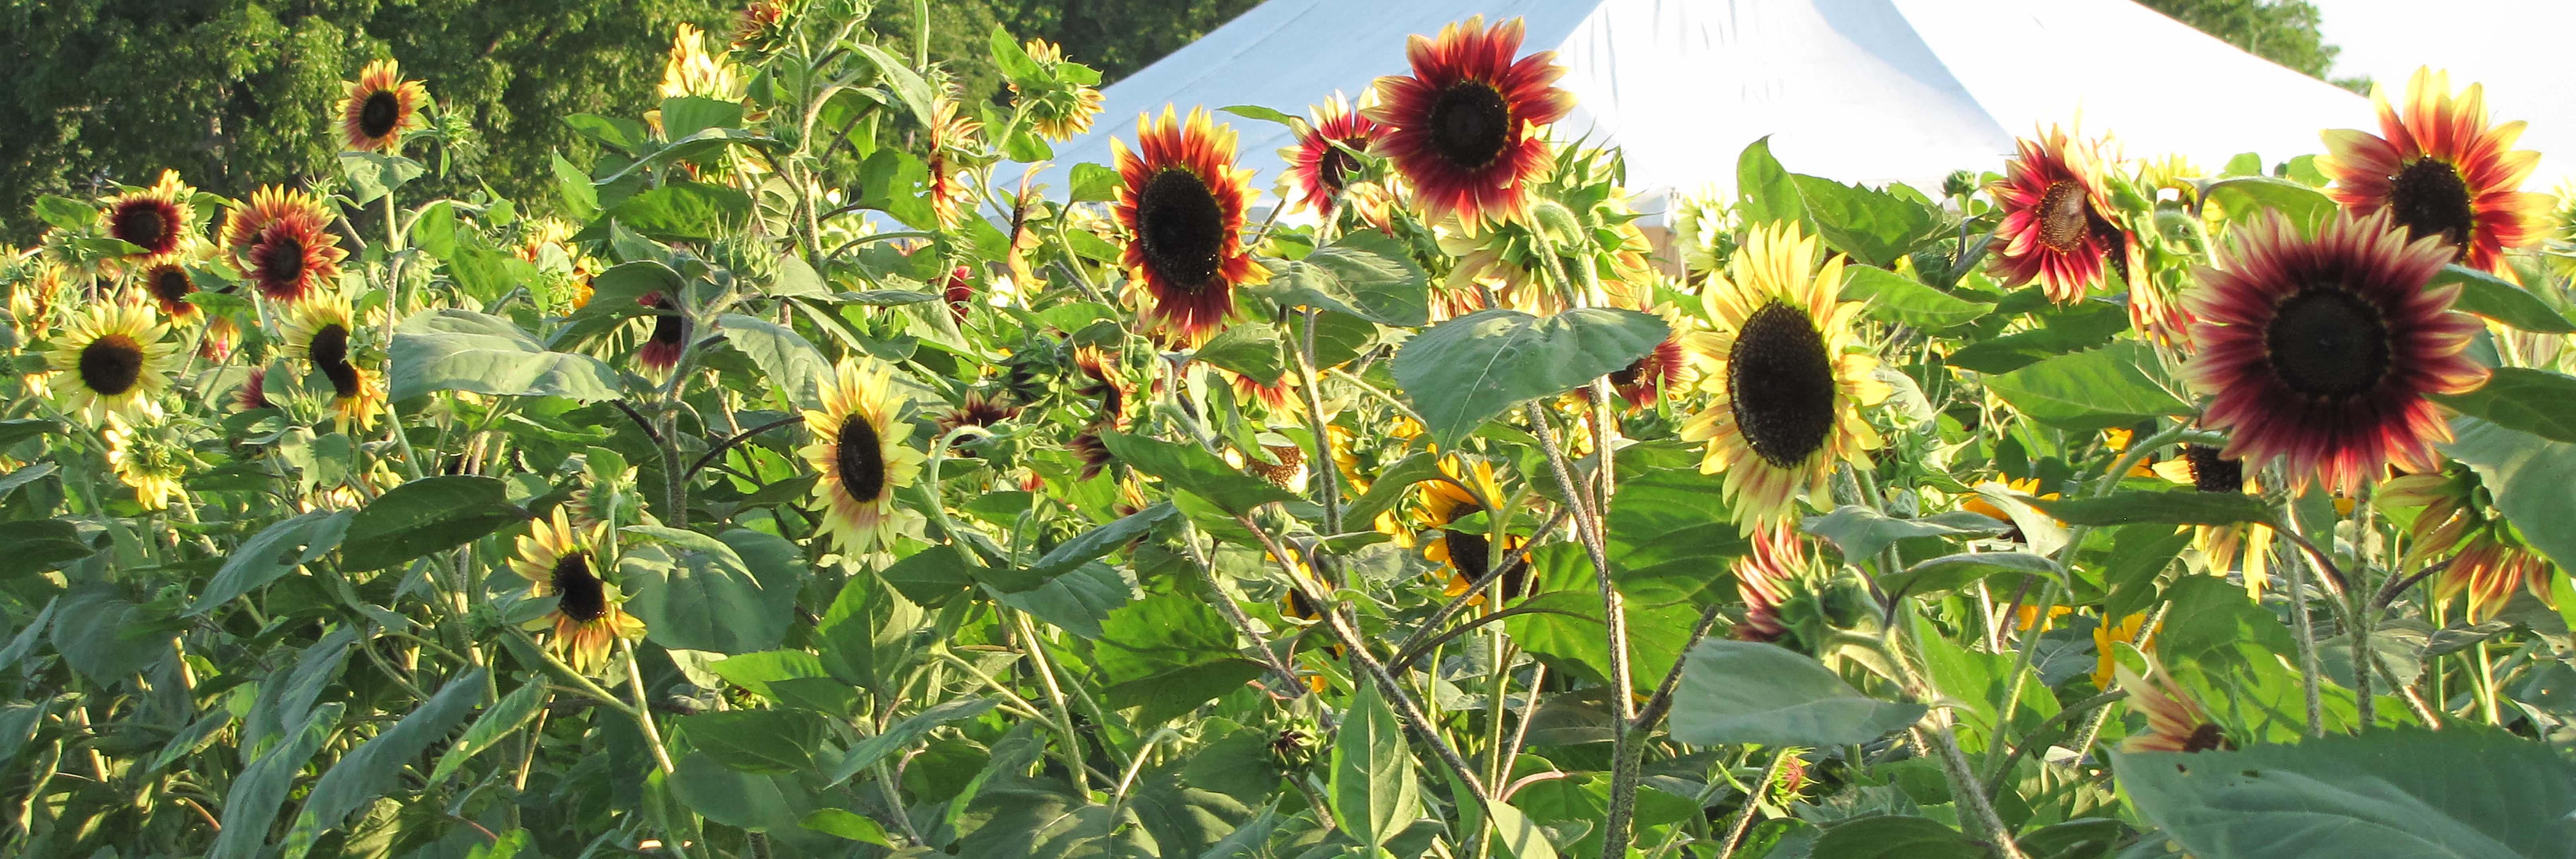 Colorful Sunflowers-Horizontal